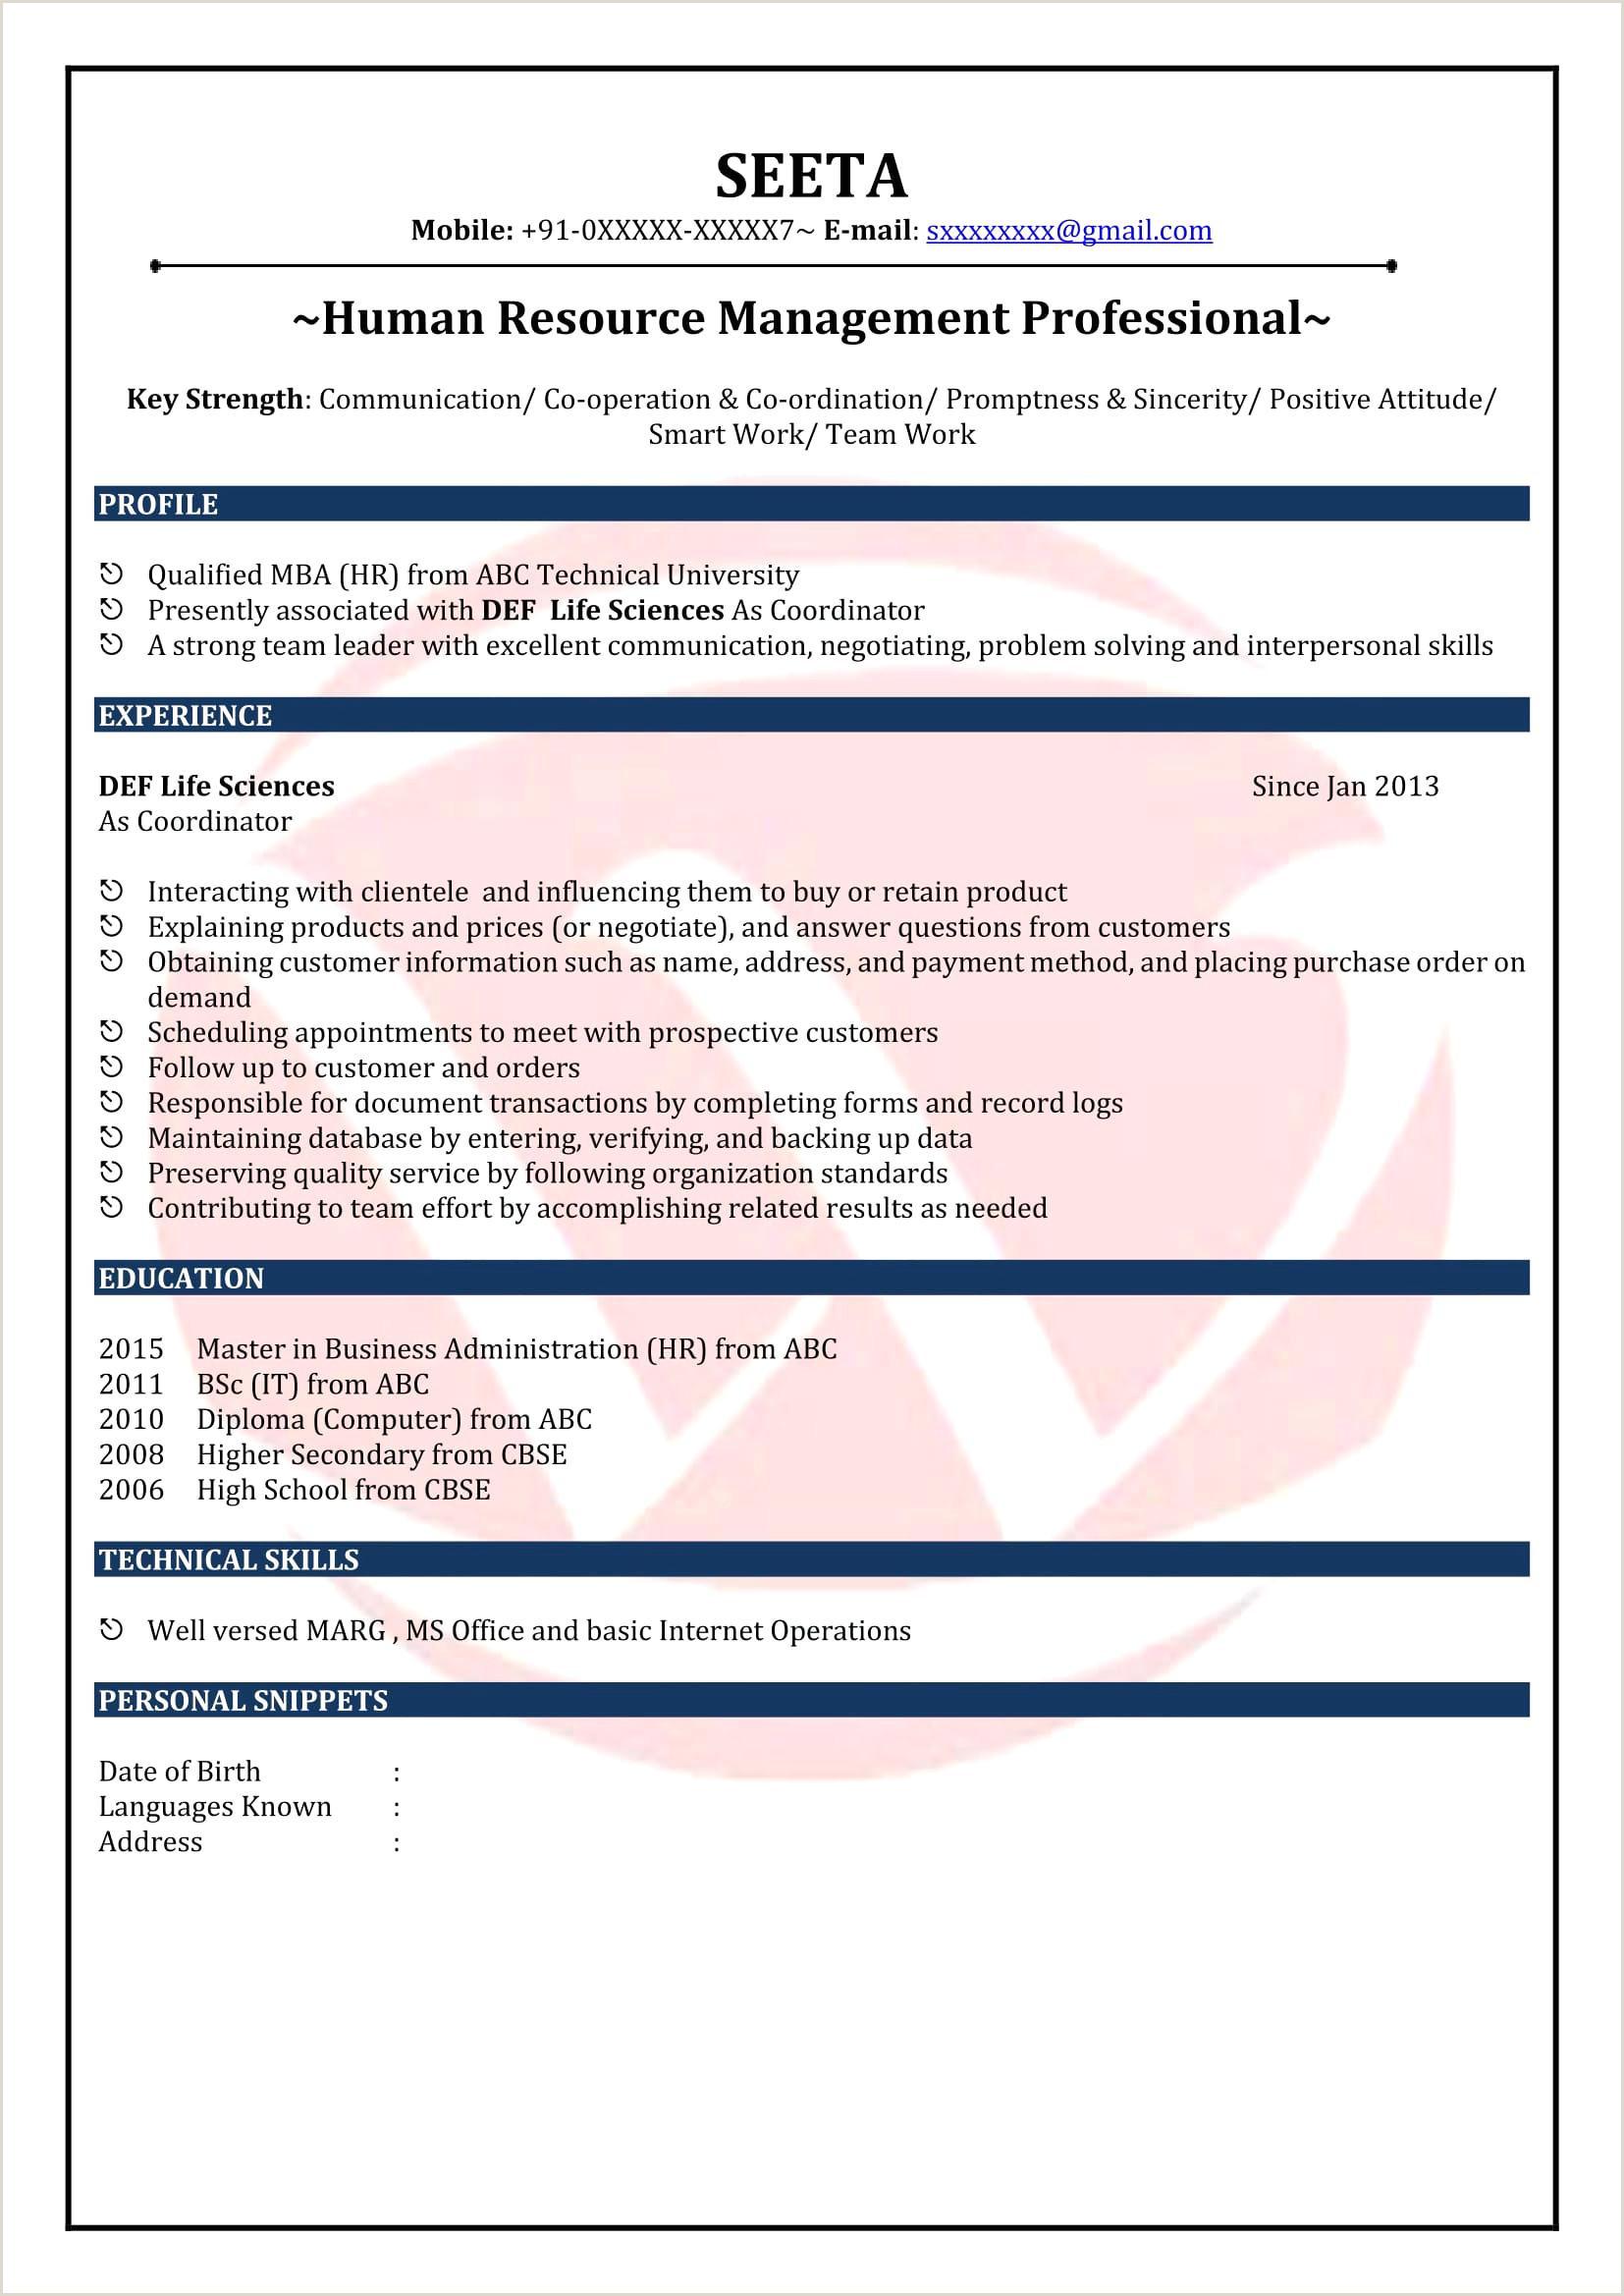 Diploma Fresher Resume format Pdf Beautiful Mba Fresher Resume format Pdf